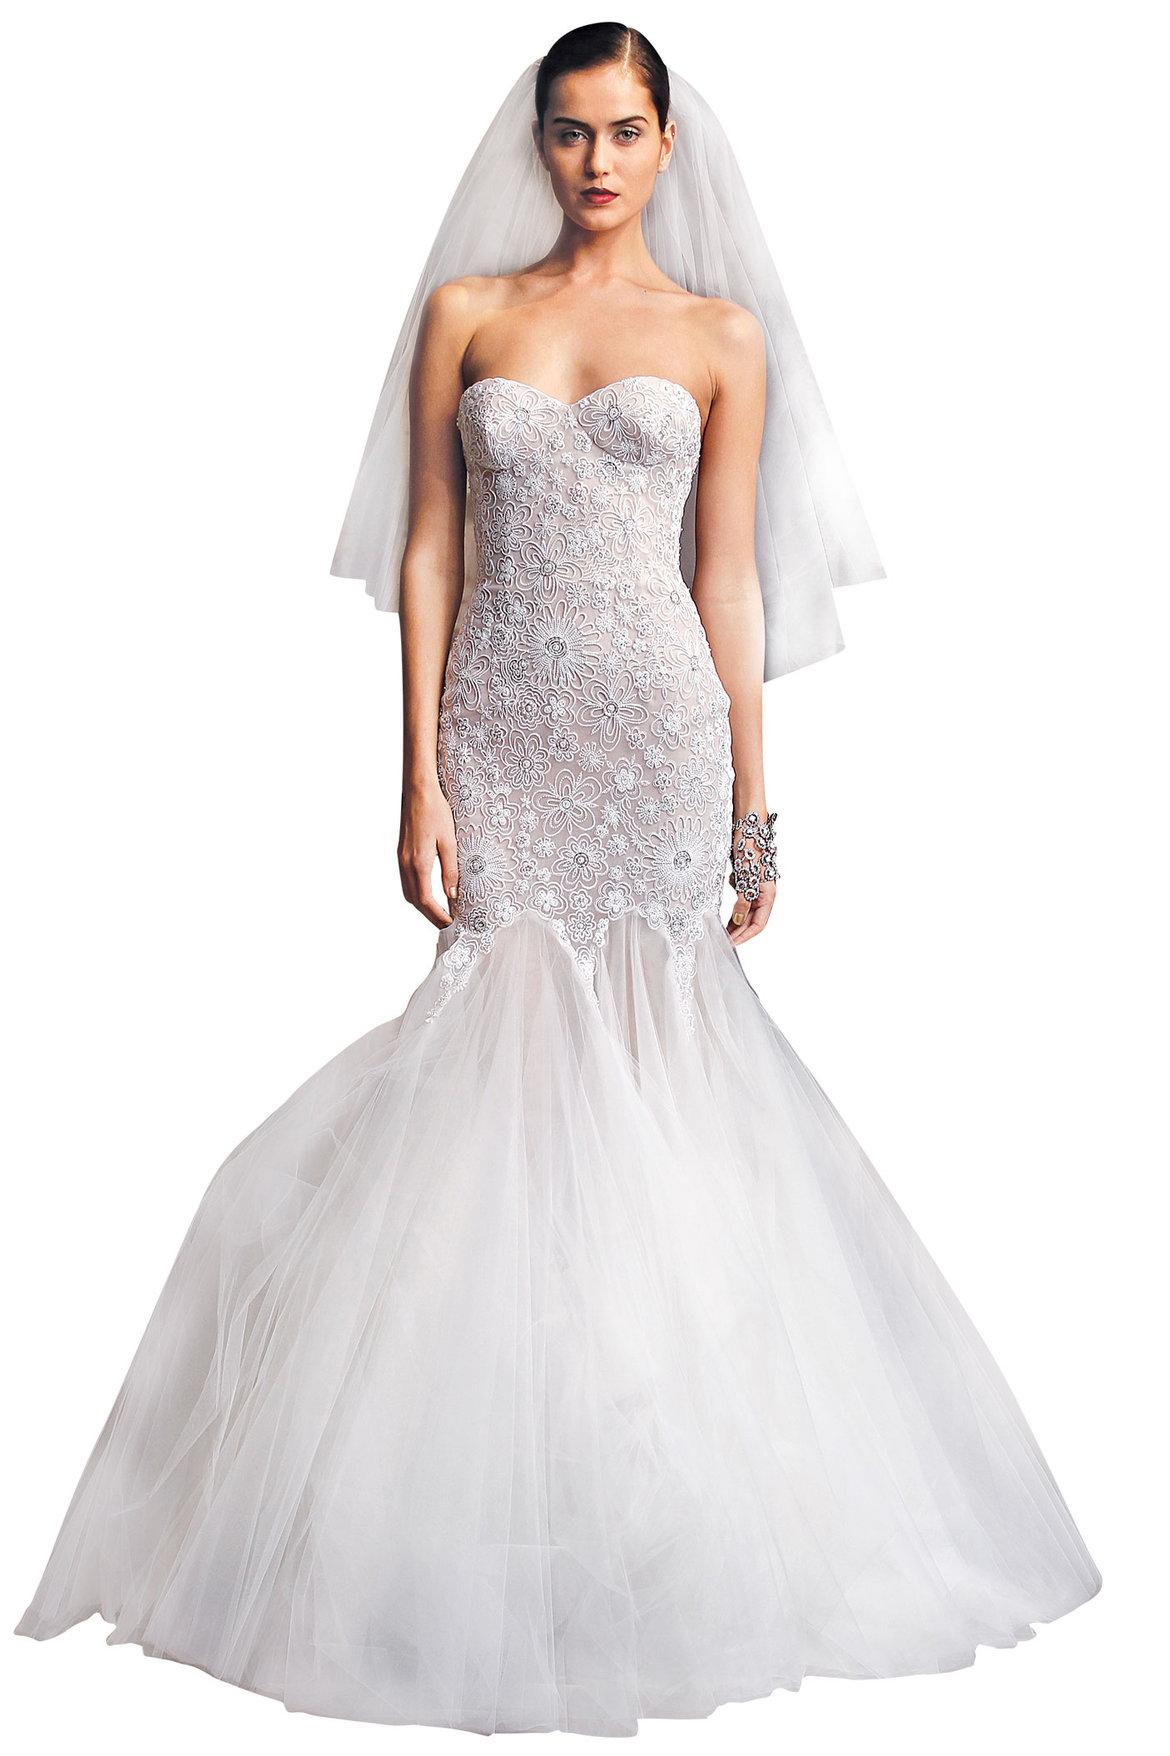 Unique Wedding Dress for Plus Size Hourglass Figure | Wedding